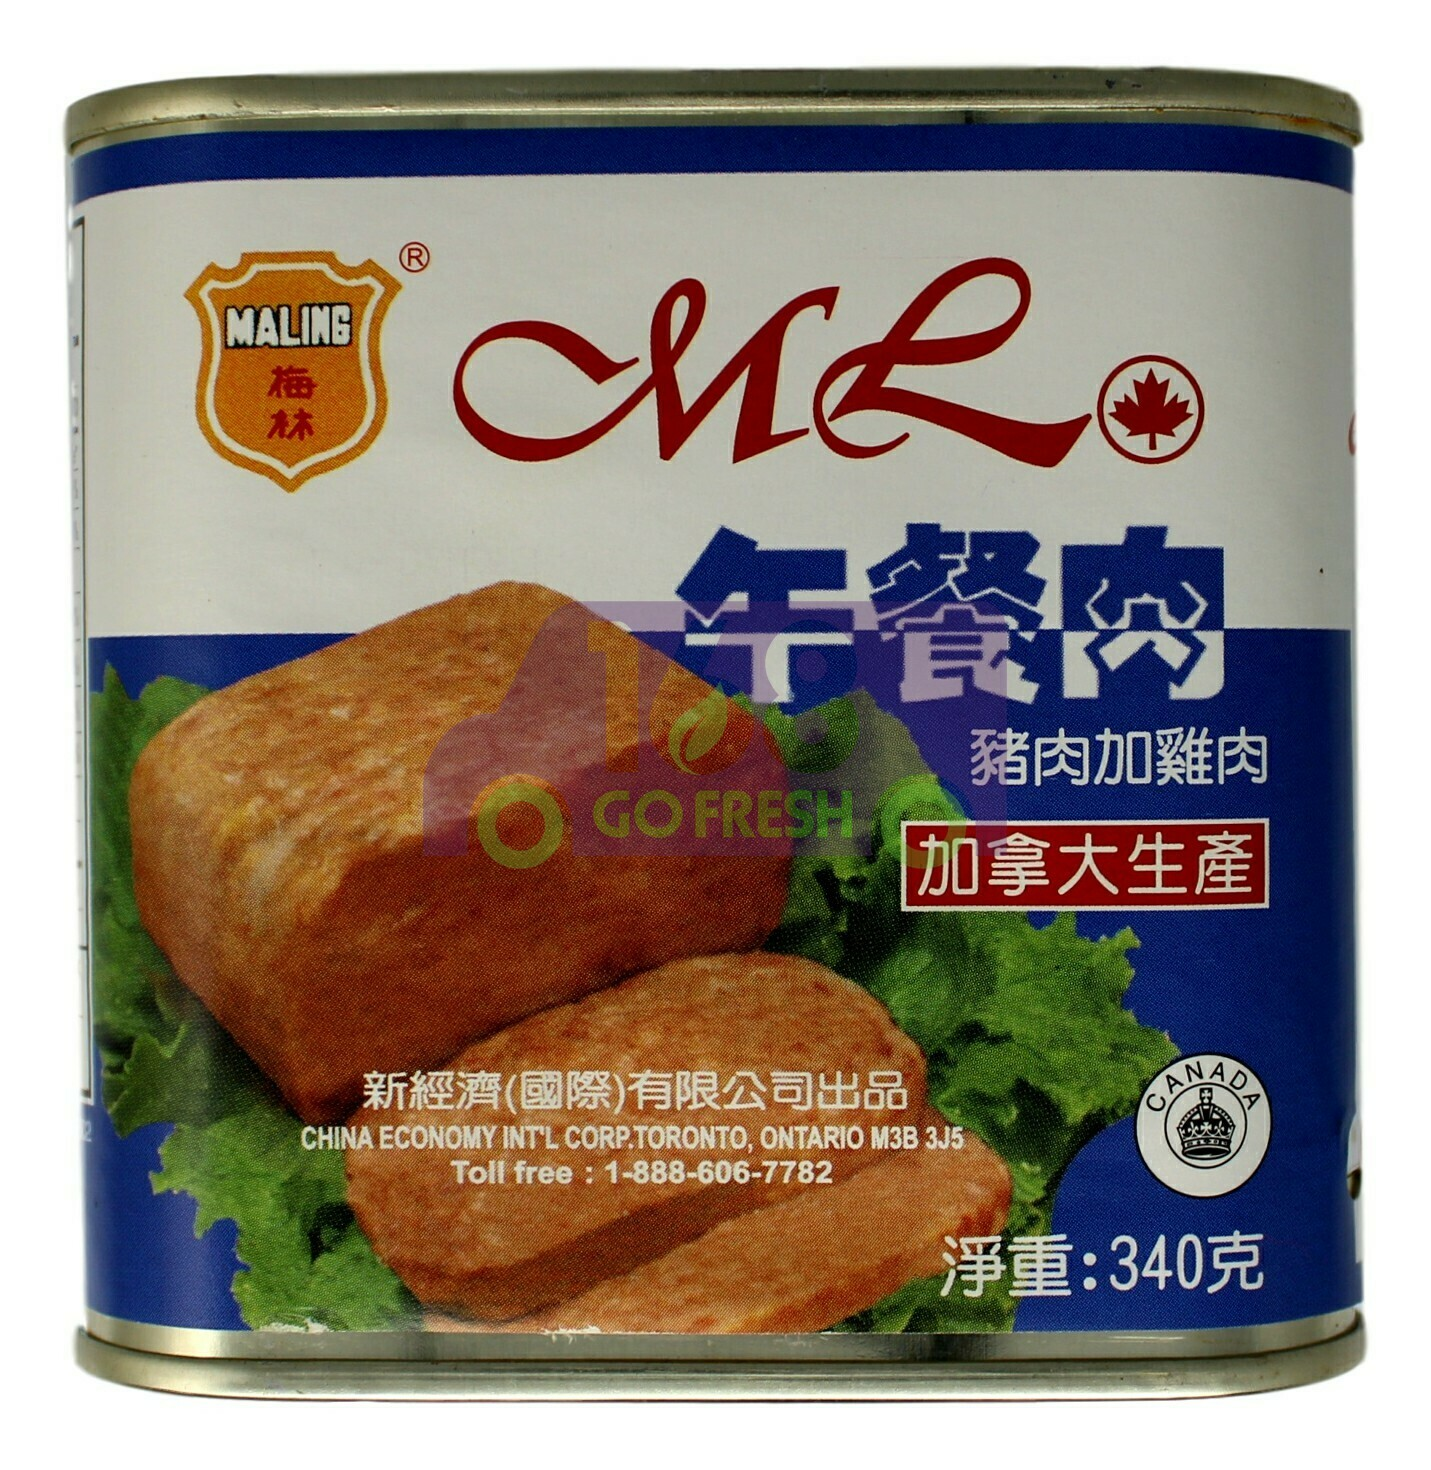 MALING LUNCHEON MEAT 梅林 优质午餐肉(猪肉加鸡肉)(340G)